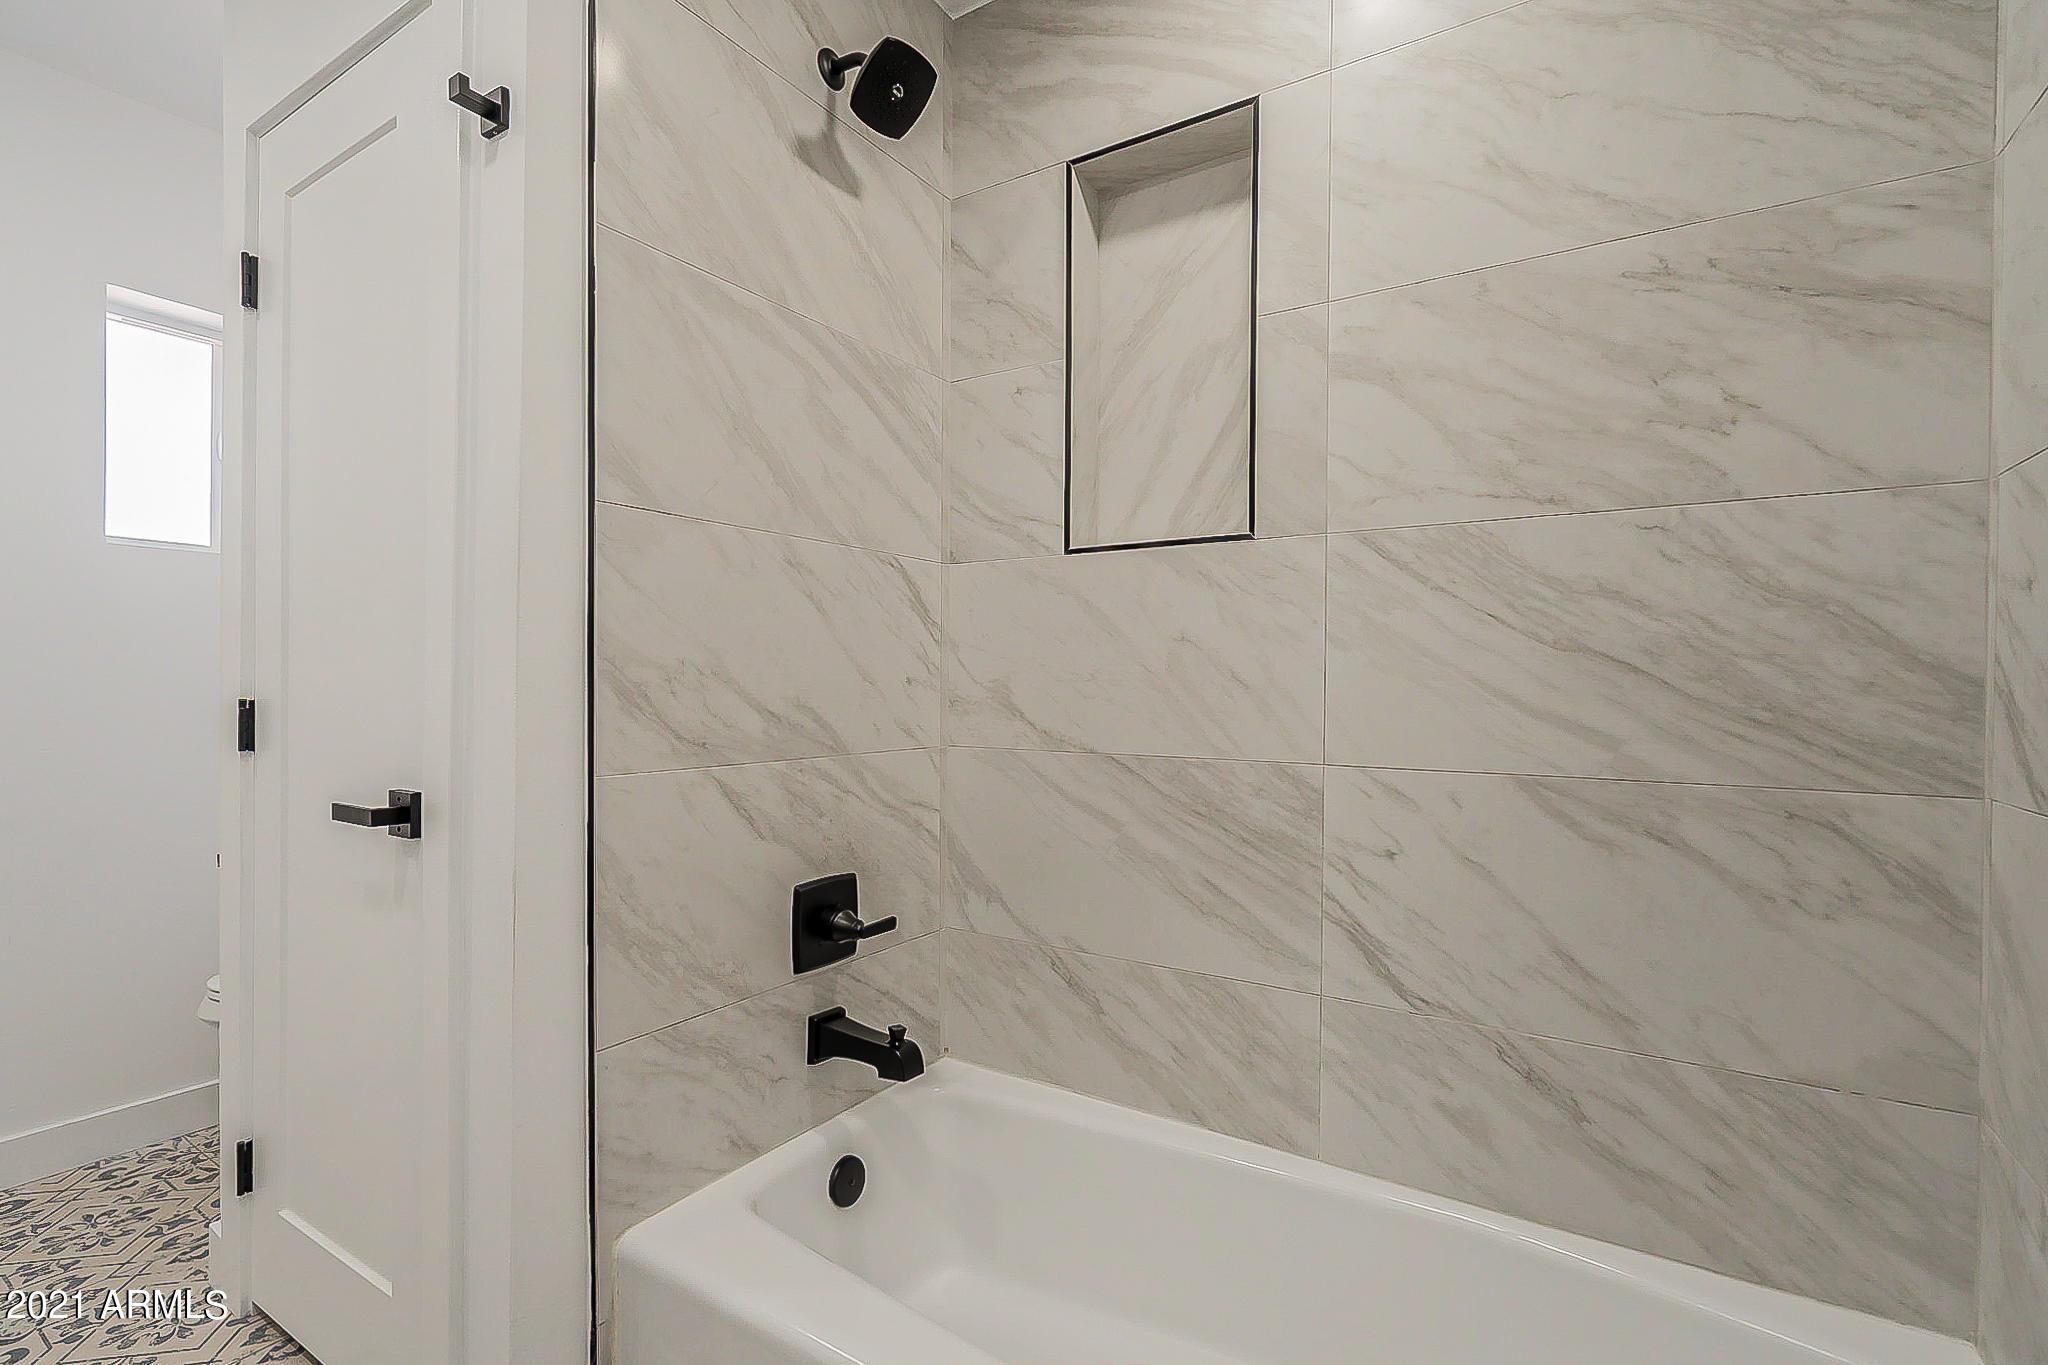 5725 BETTY ELYSE Lane, Scottsdale, Arizona 85254, 4 Bedrooms Bedrooms, ,2 BathroomsBathrooms,Residential,For Sale,BETTY ELYSE,6179422